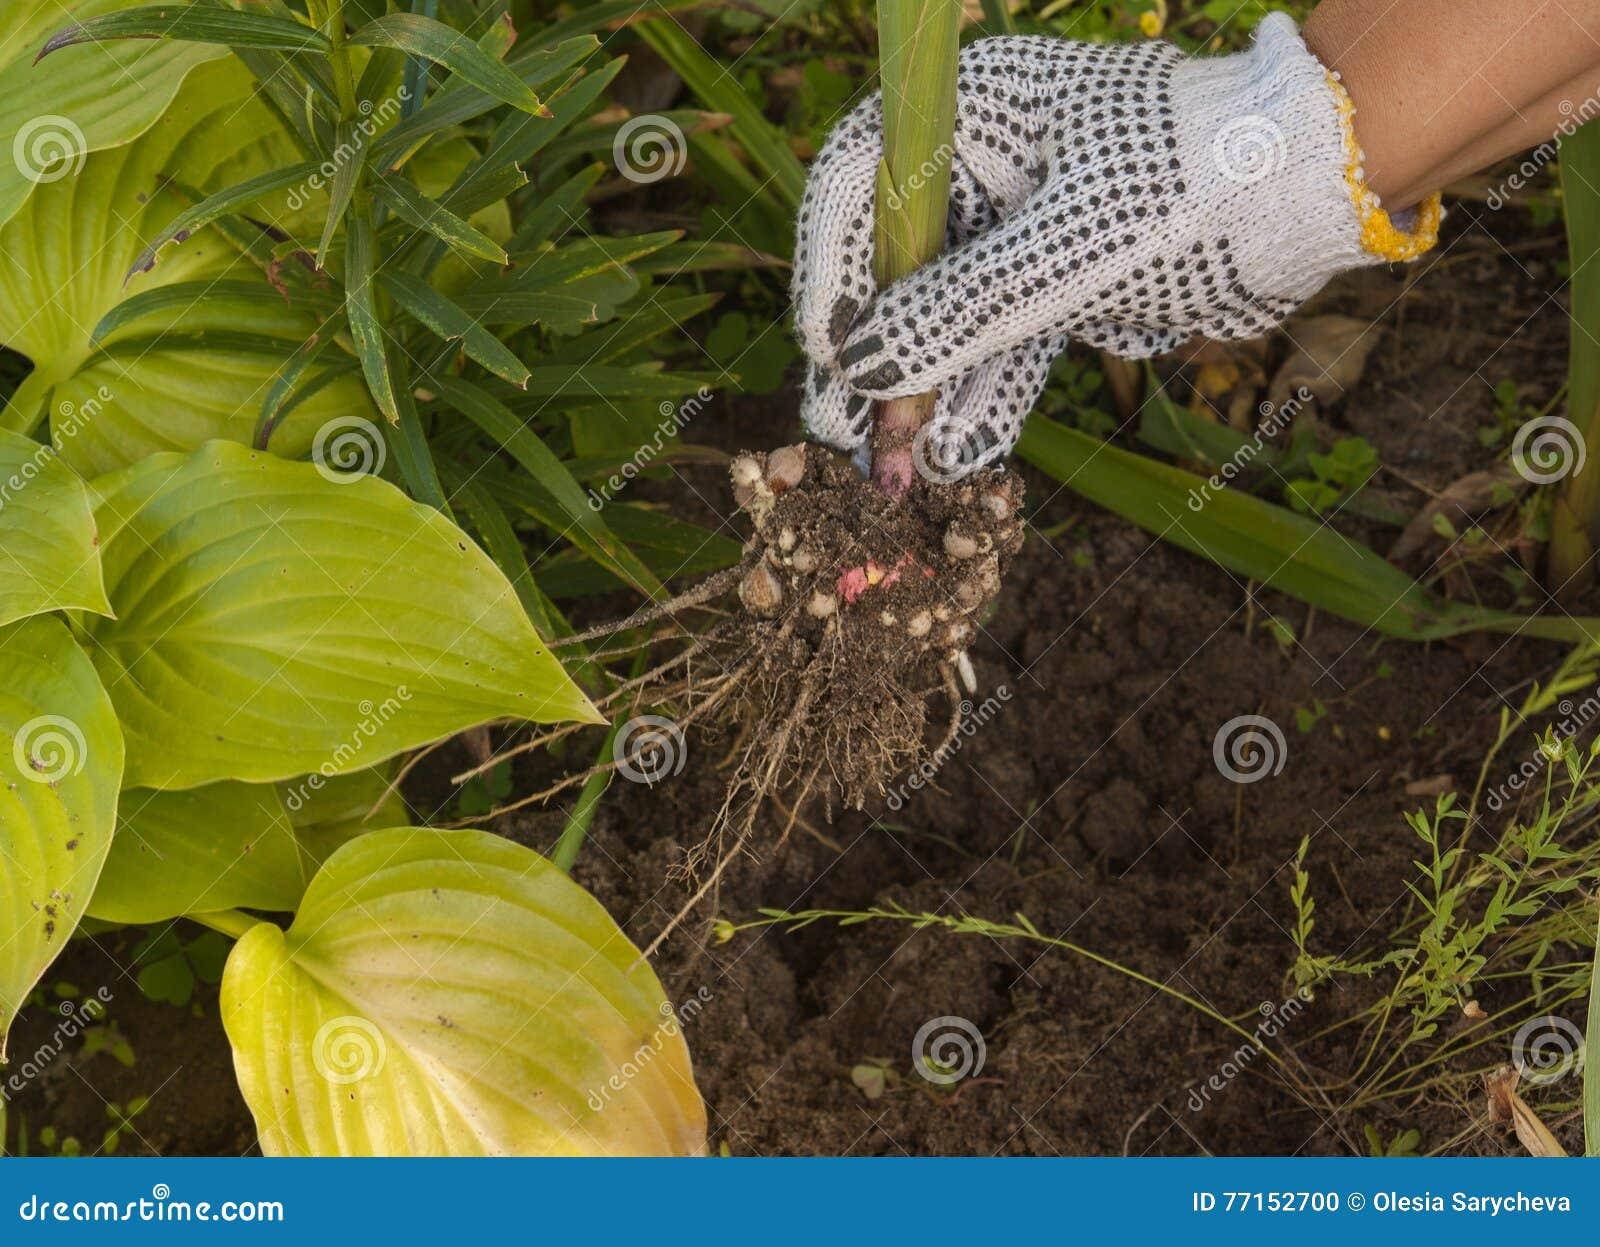 La main femelle creuse le glaïeul